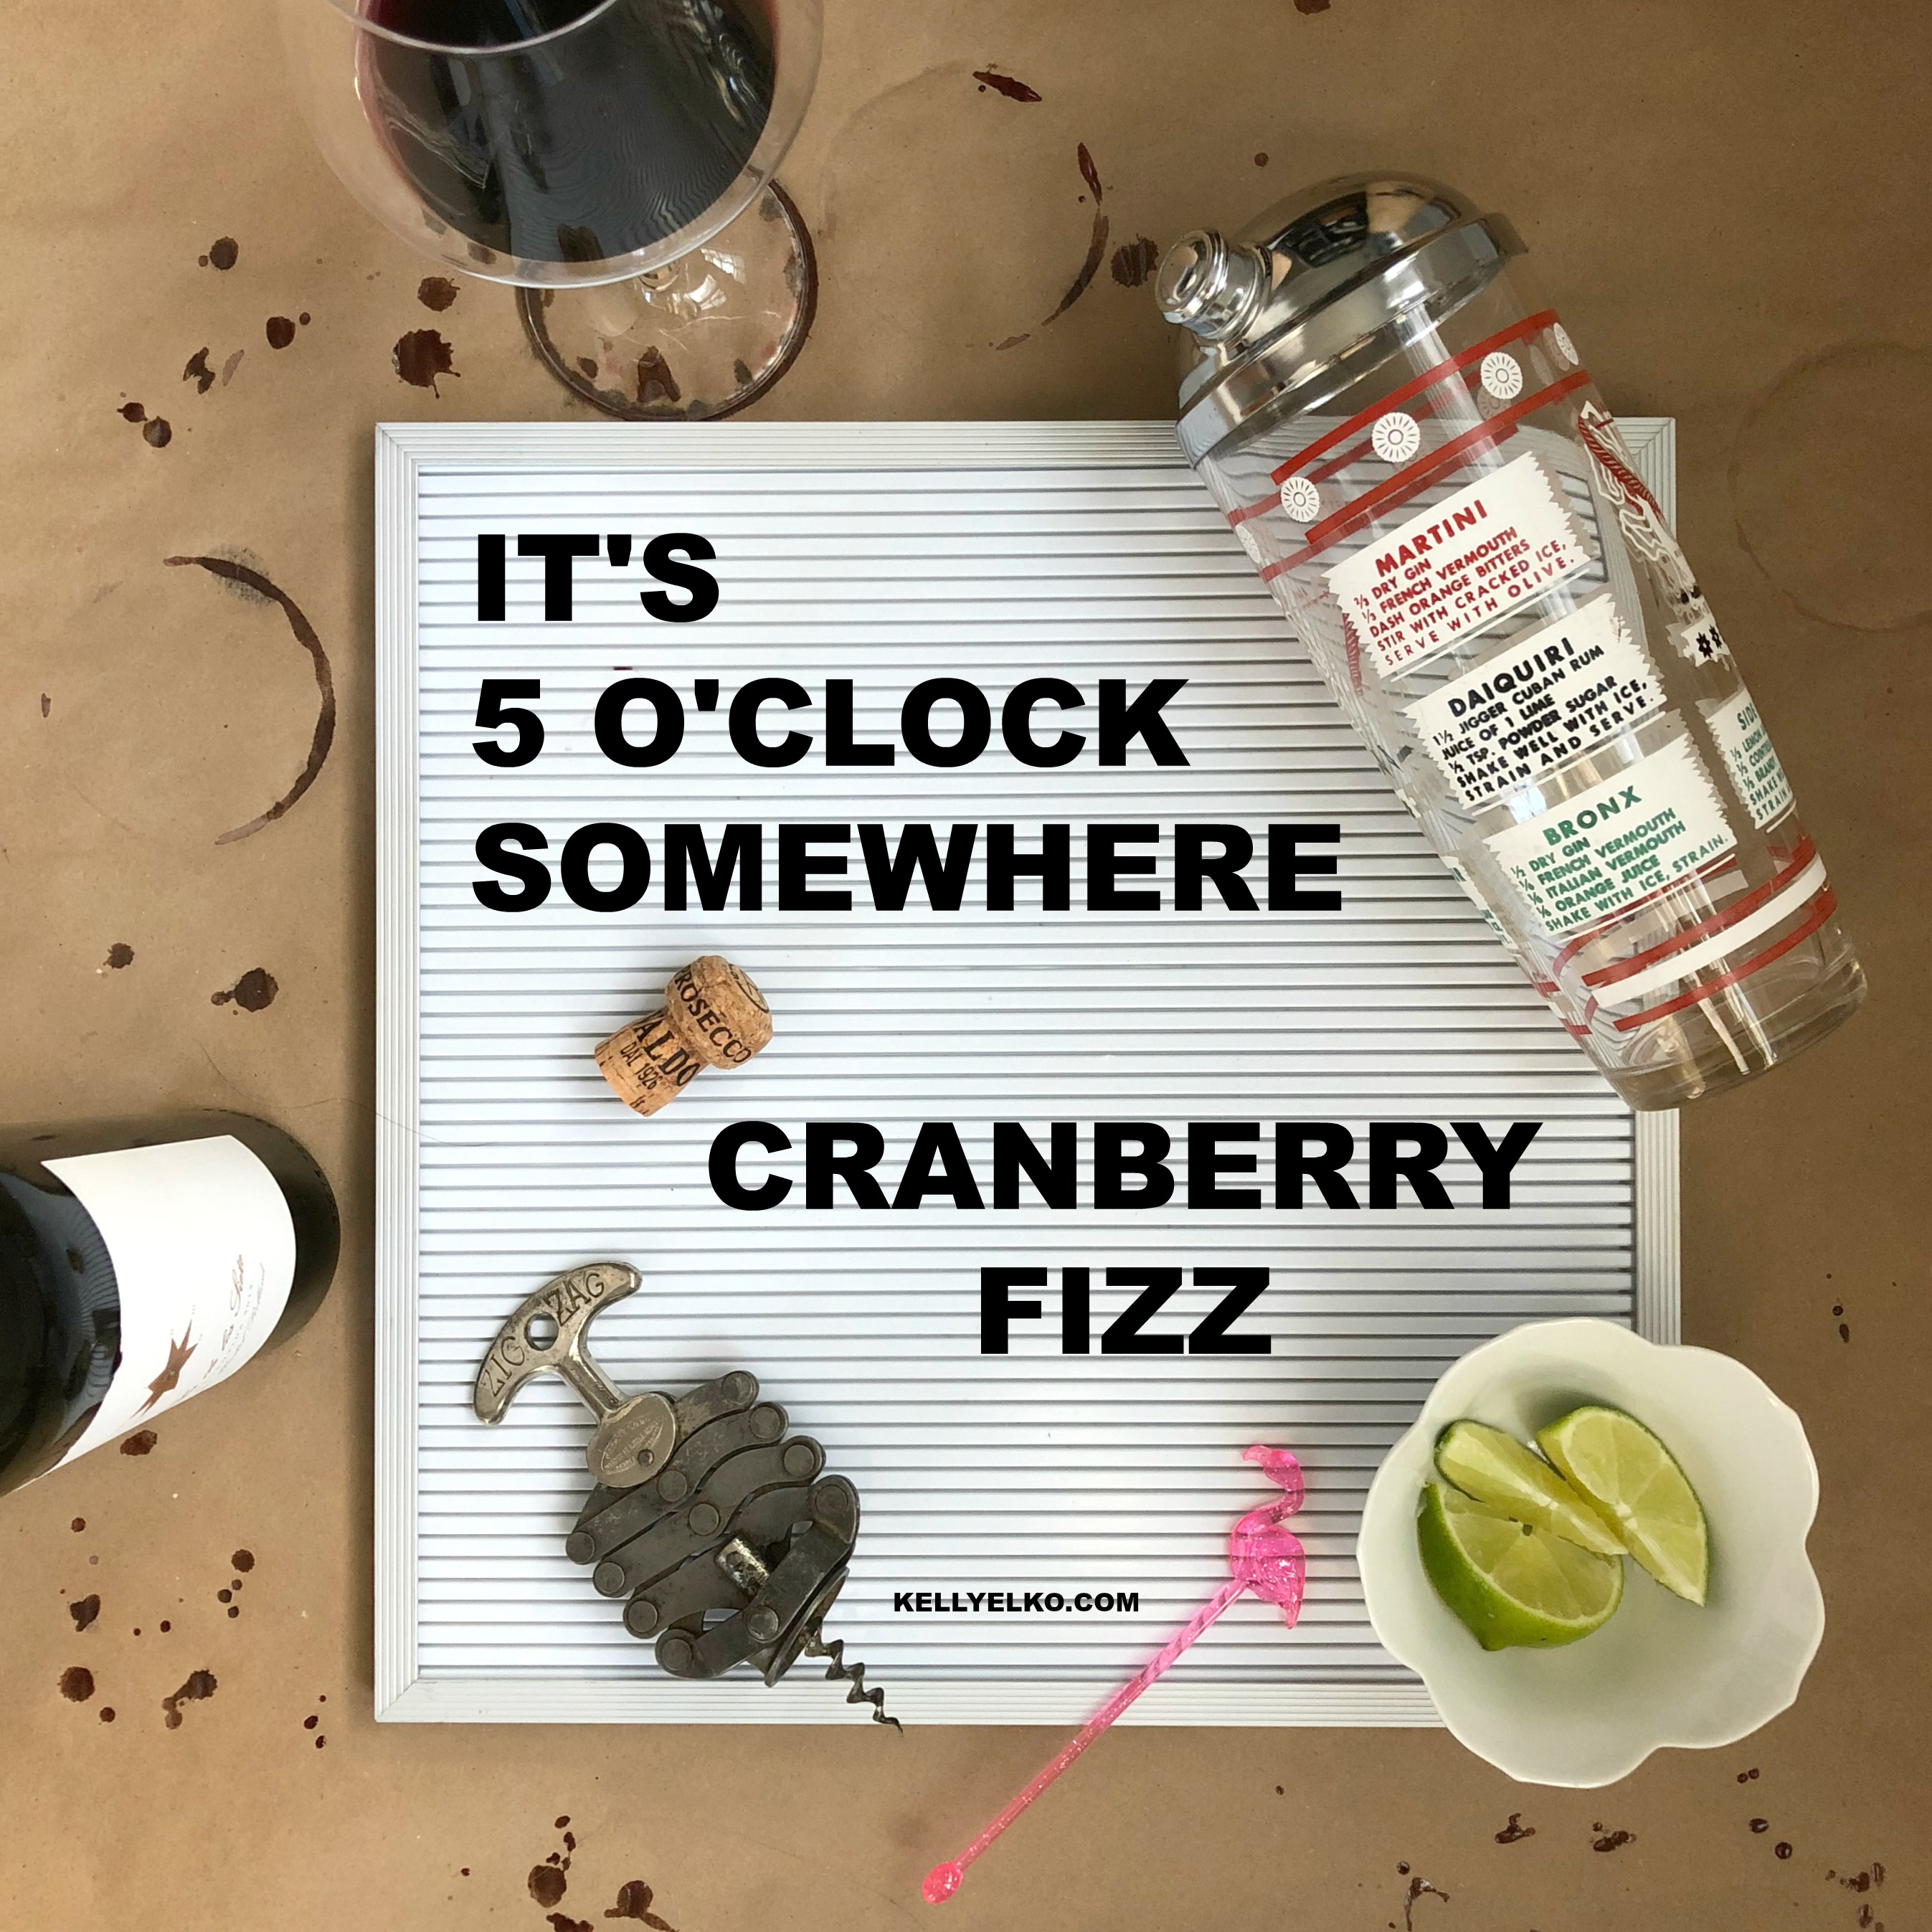 It's 5 O'Clock Somewhere - amazing cocktail recipes! kellyelko.com #cocktails #cheers #cocktailrecipes #5oclocksomewhere